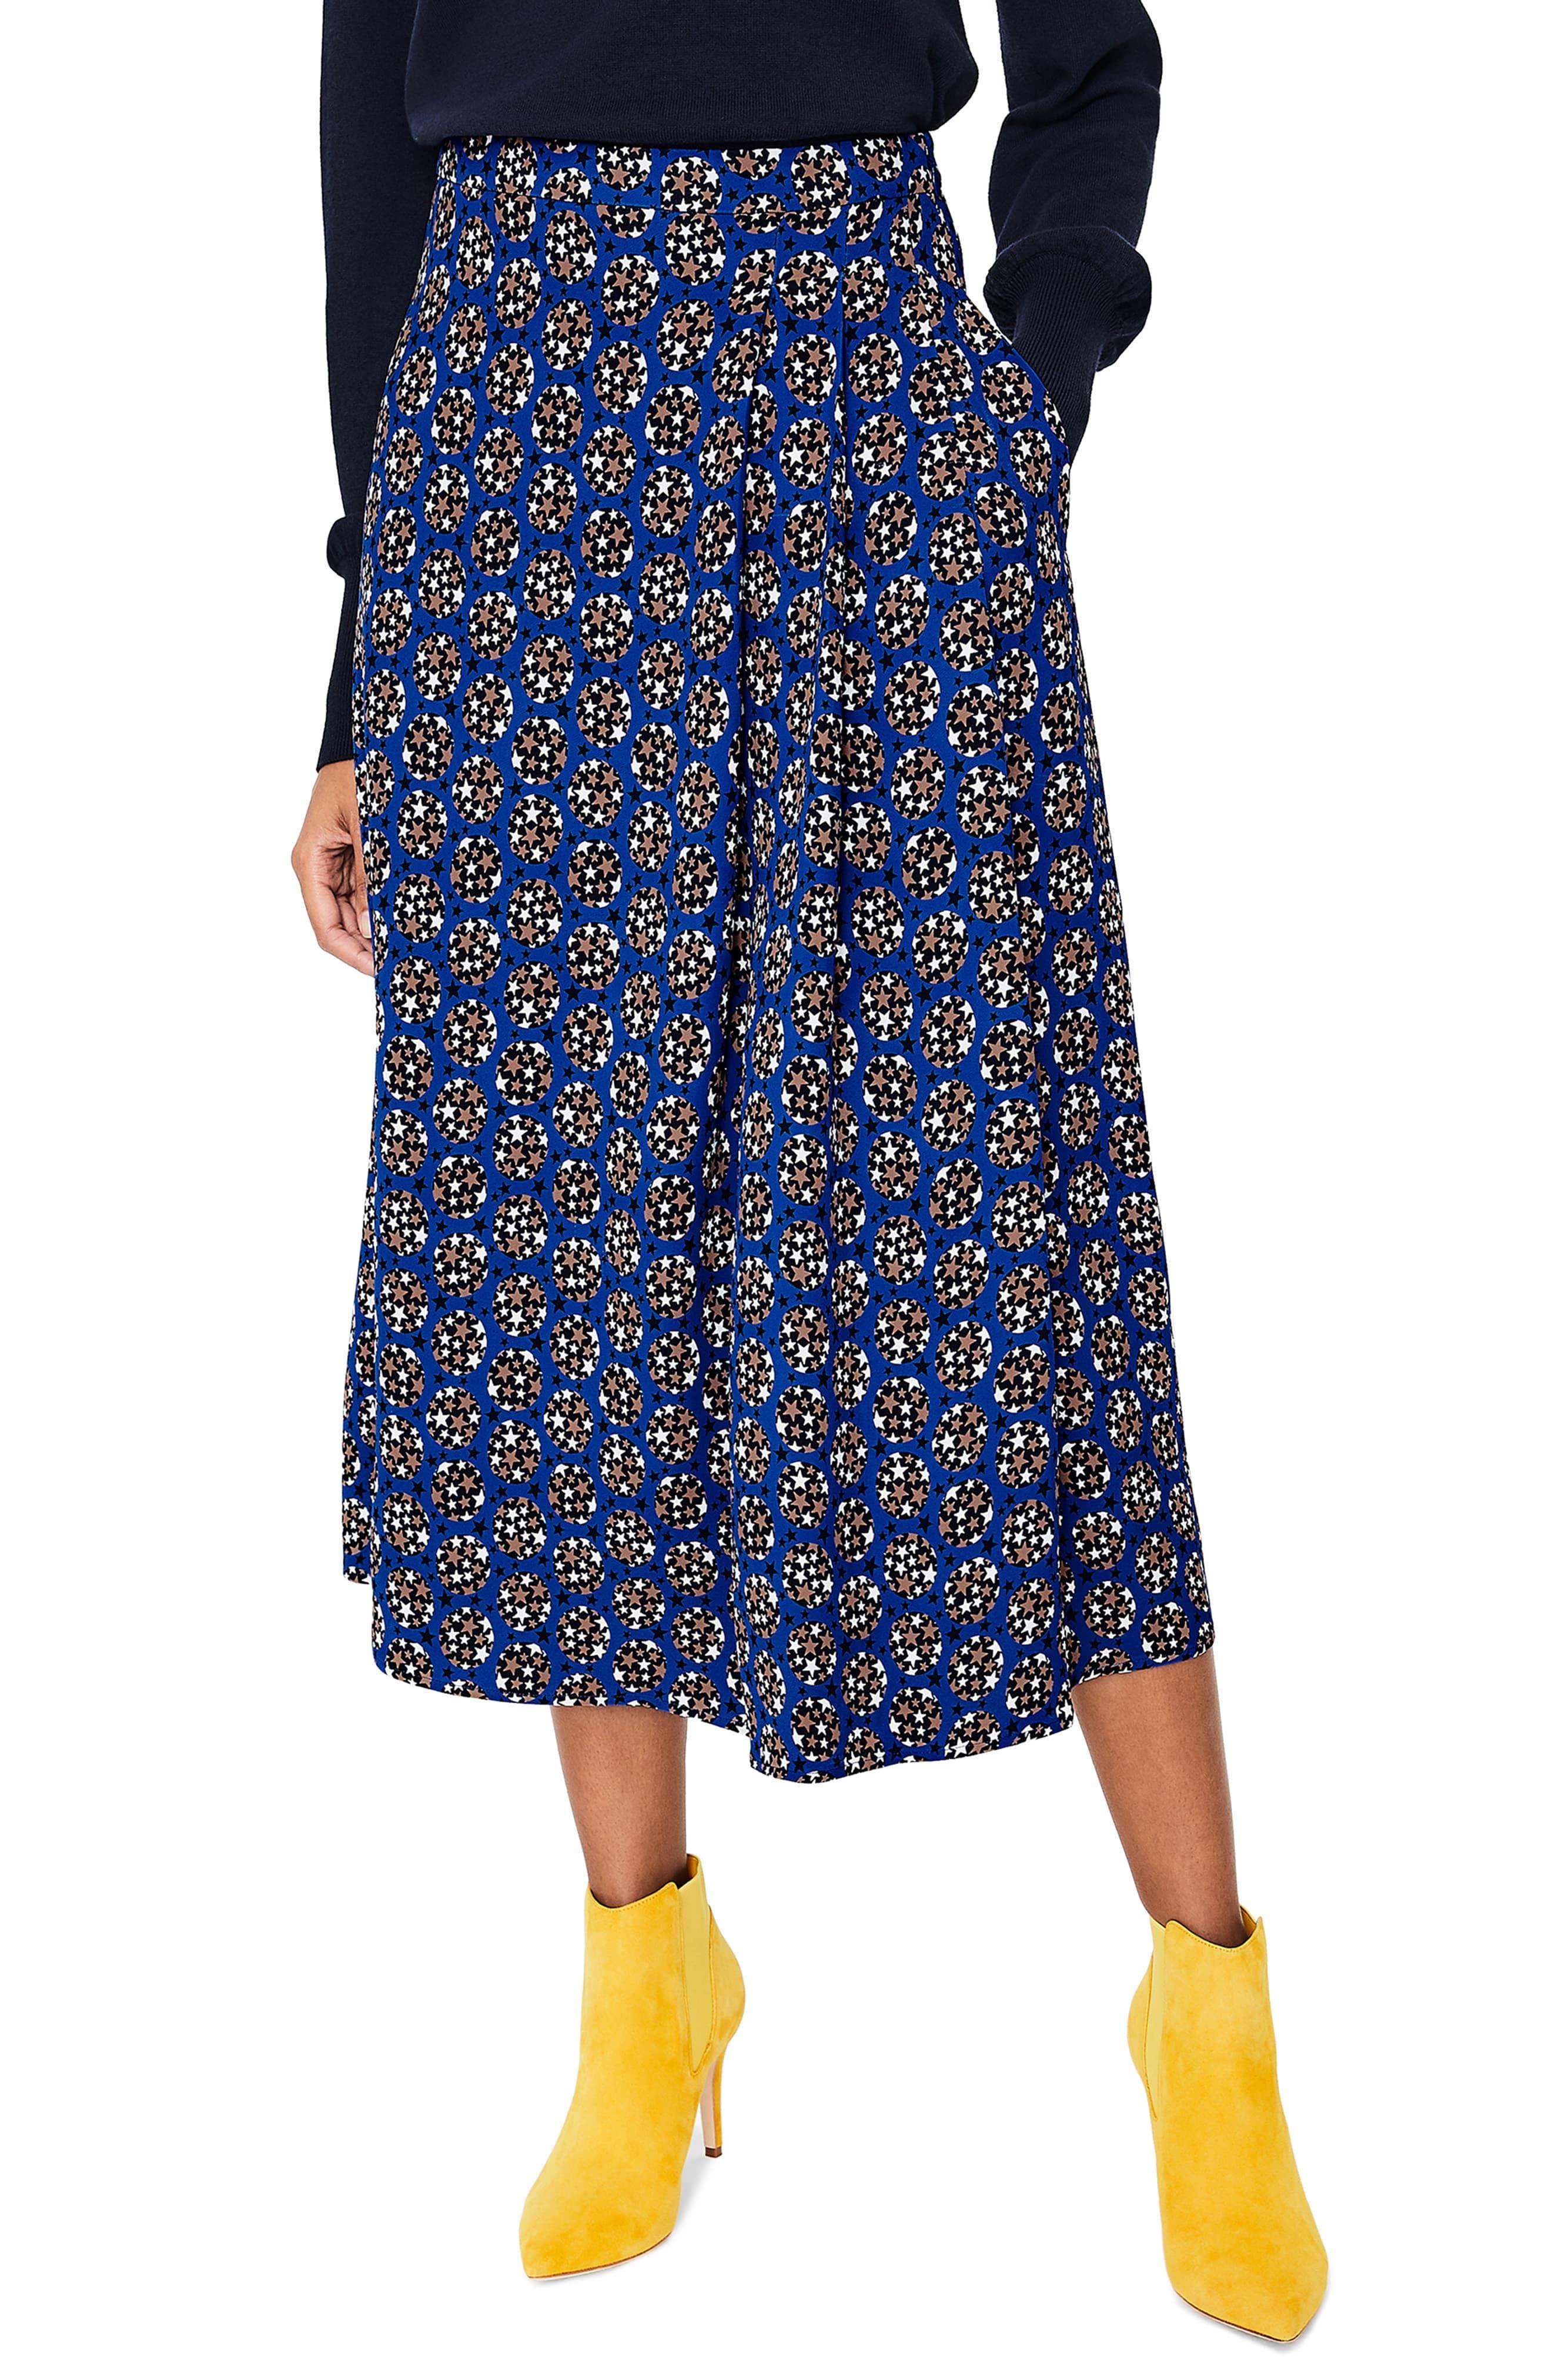 Womens petite size skirts — pic 13